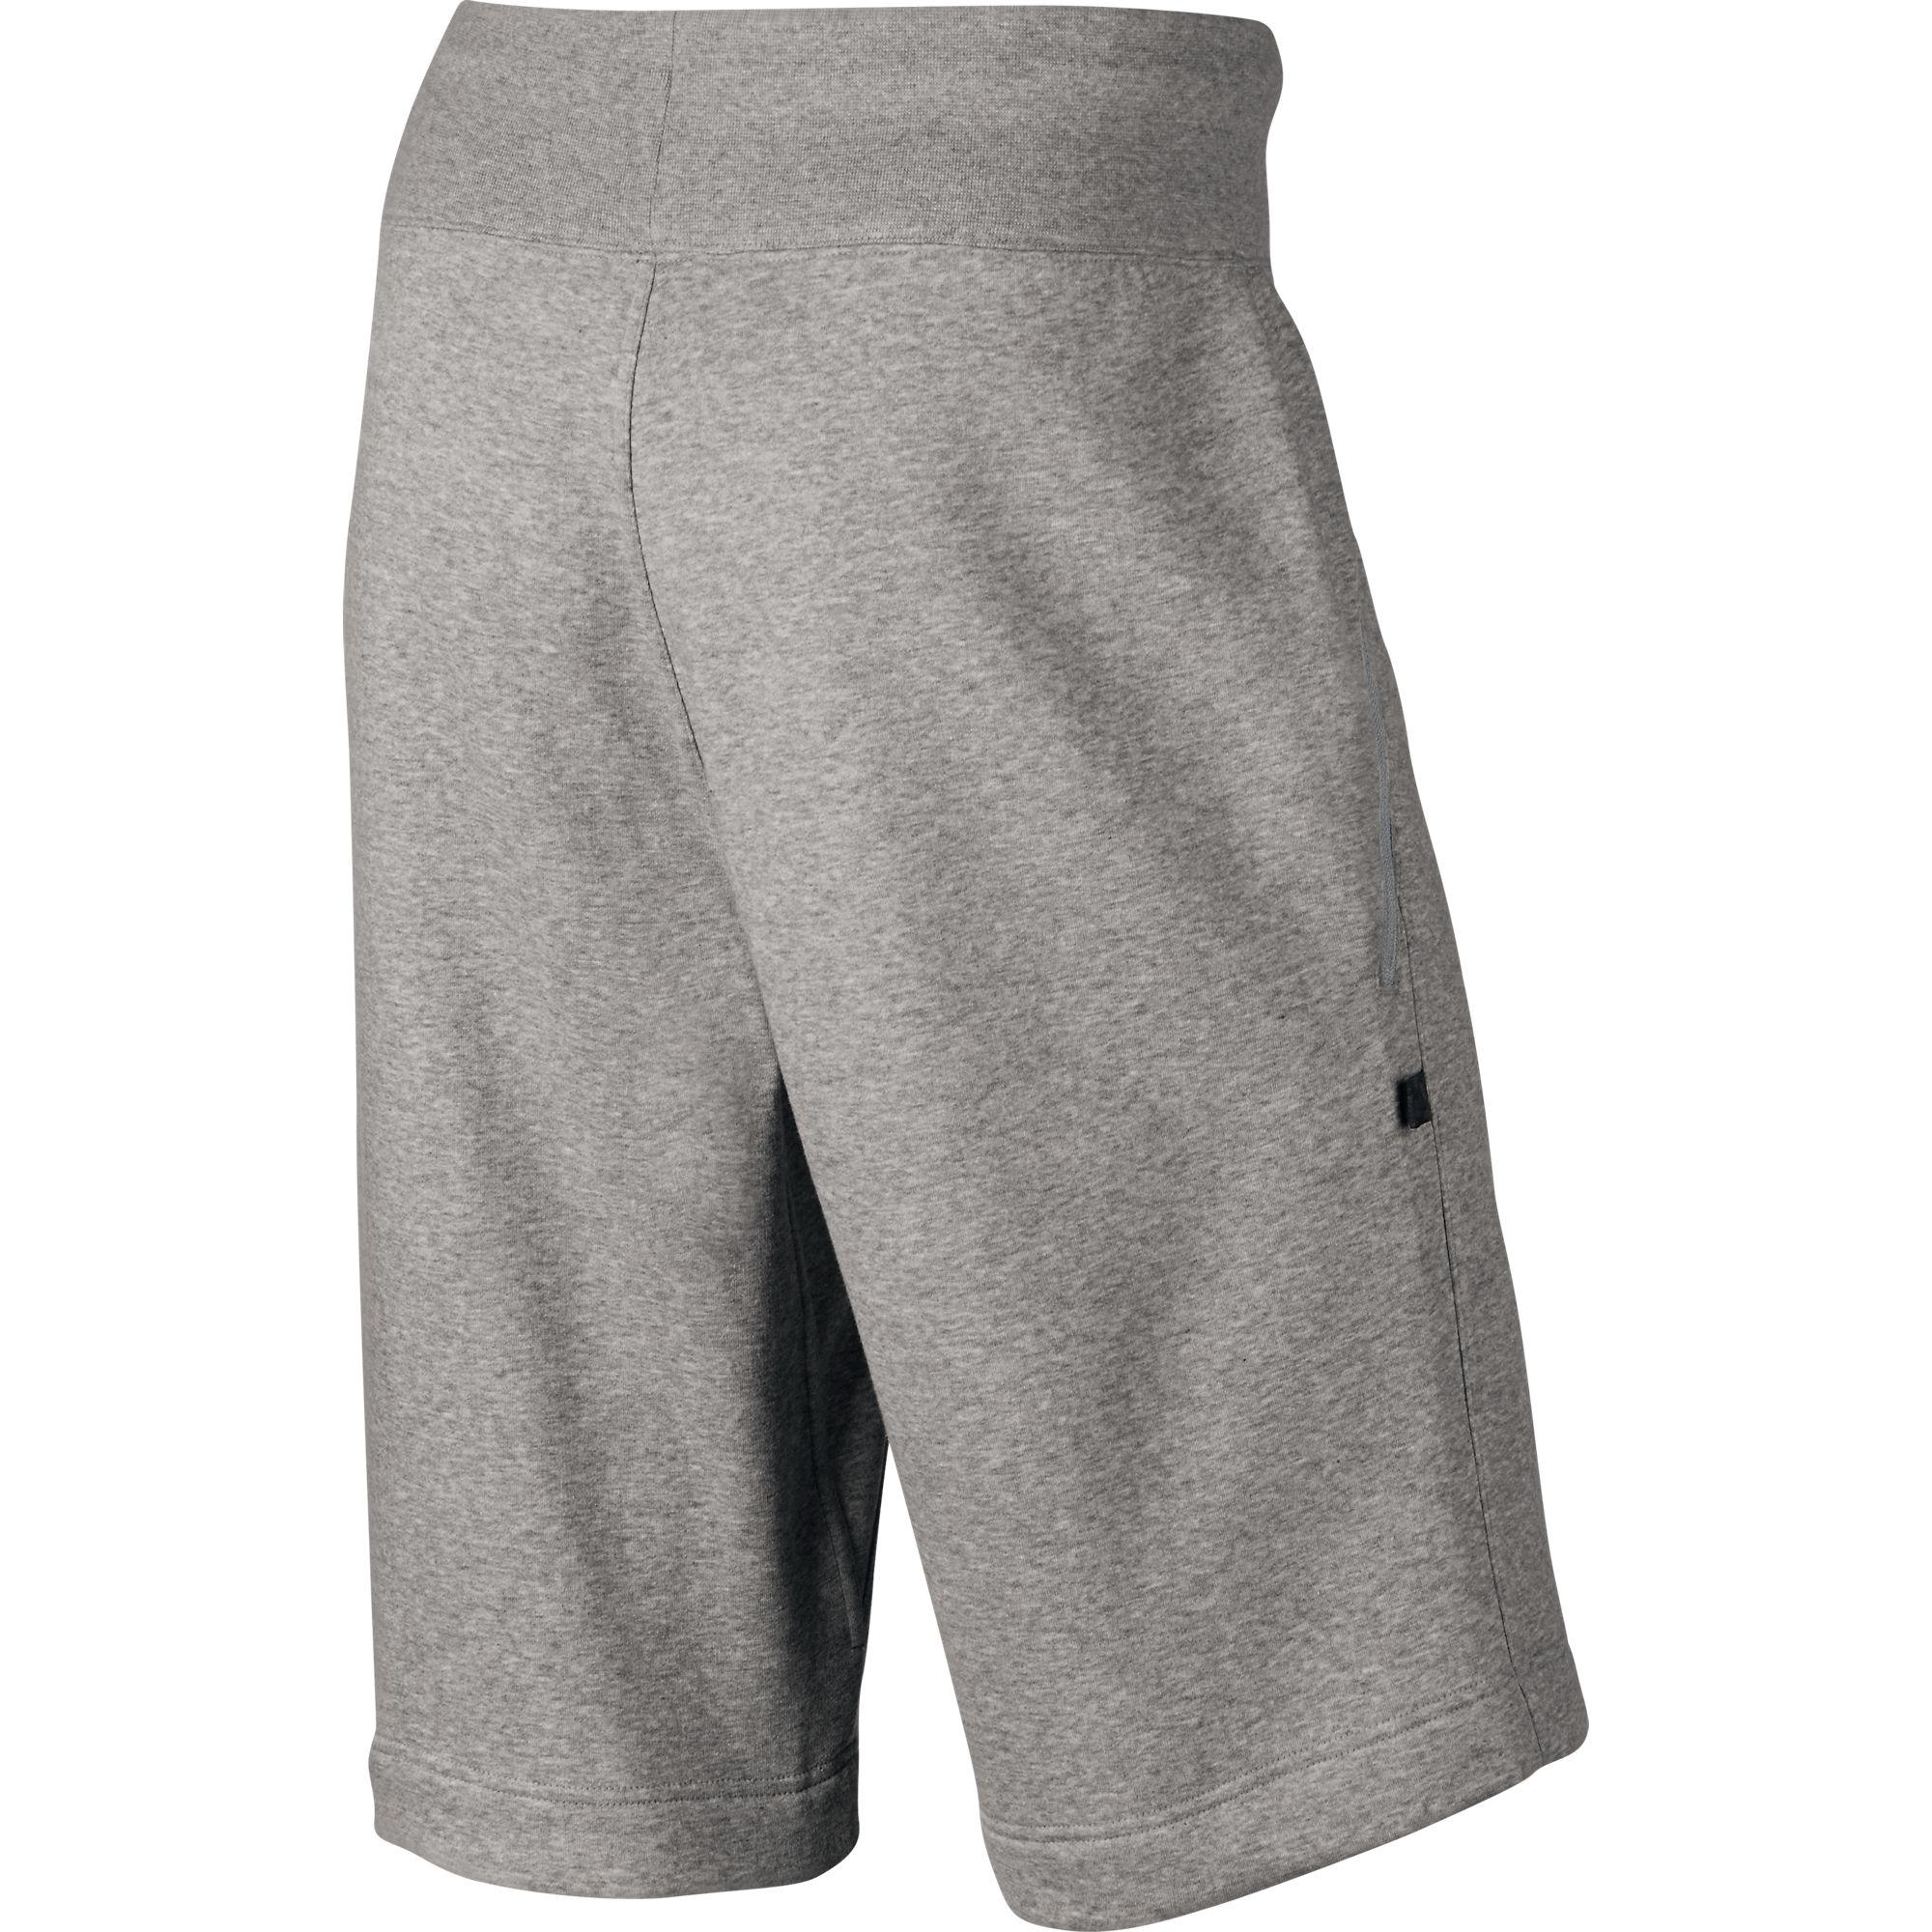 57ae9b626d0fd Jordan AJ VIII Fleece Men's Shorts Dark Grey Heather/Black 706730-063